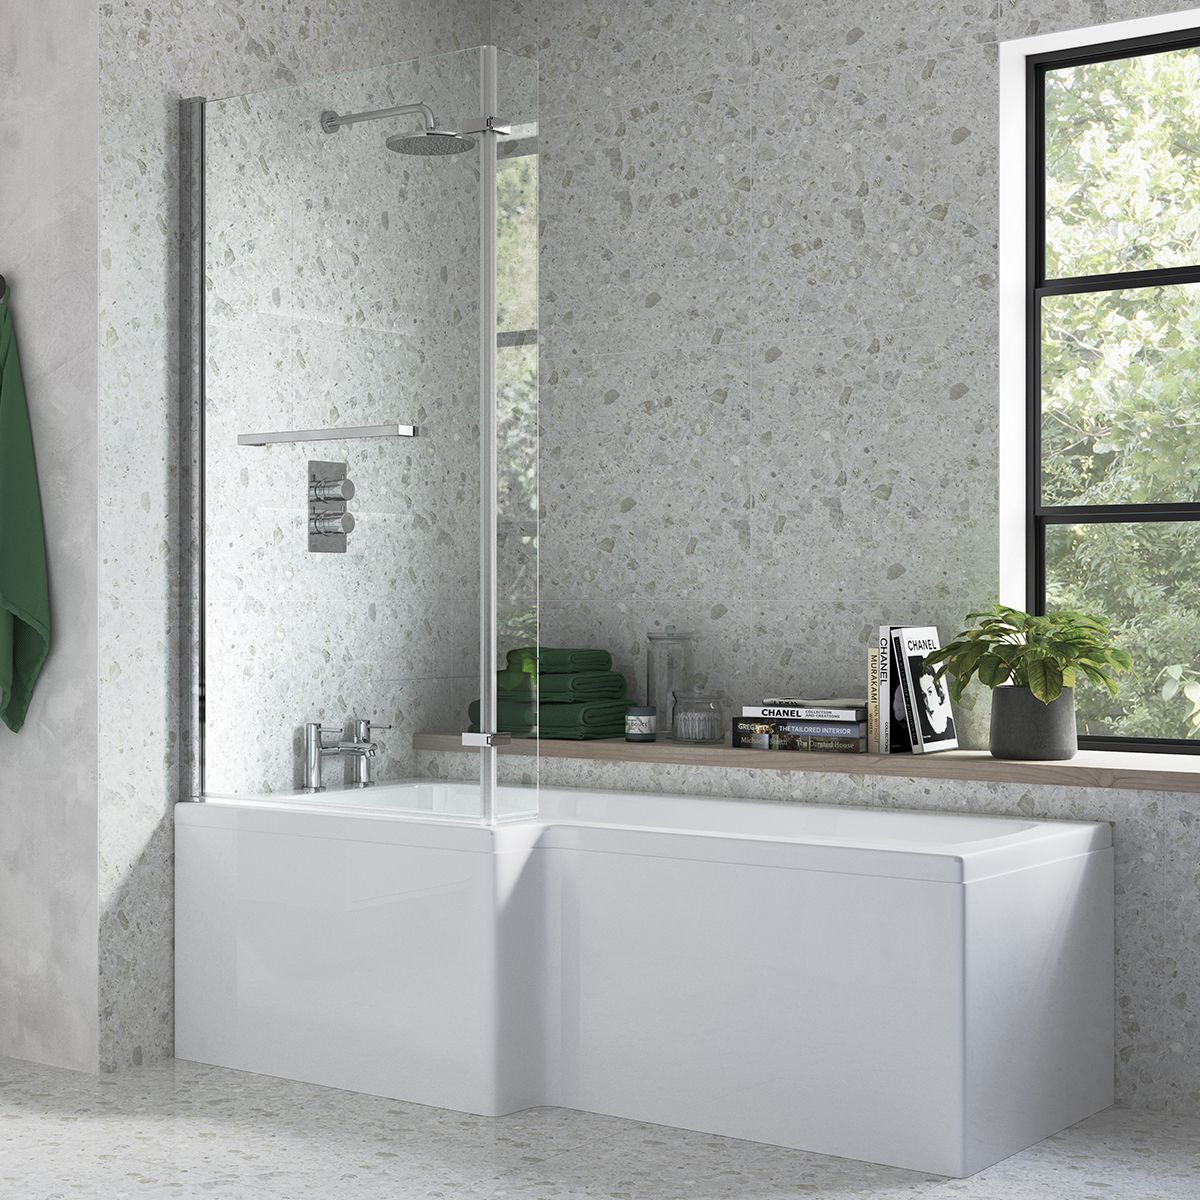 Moods Solarna L Shape Shower Bath Pack